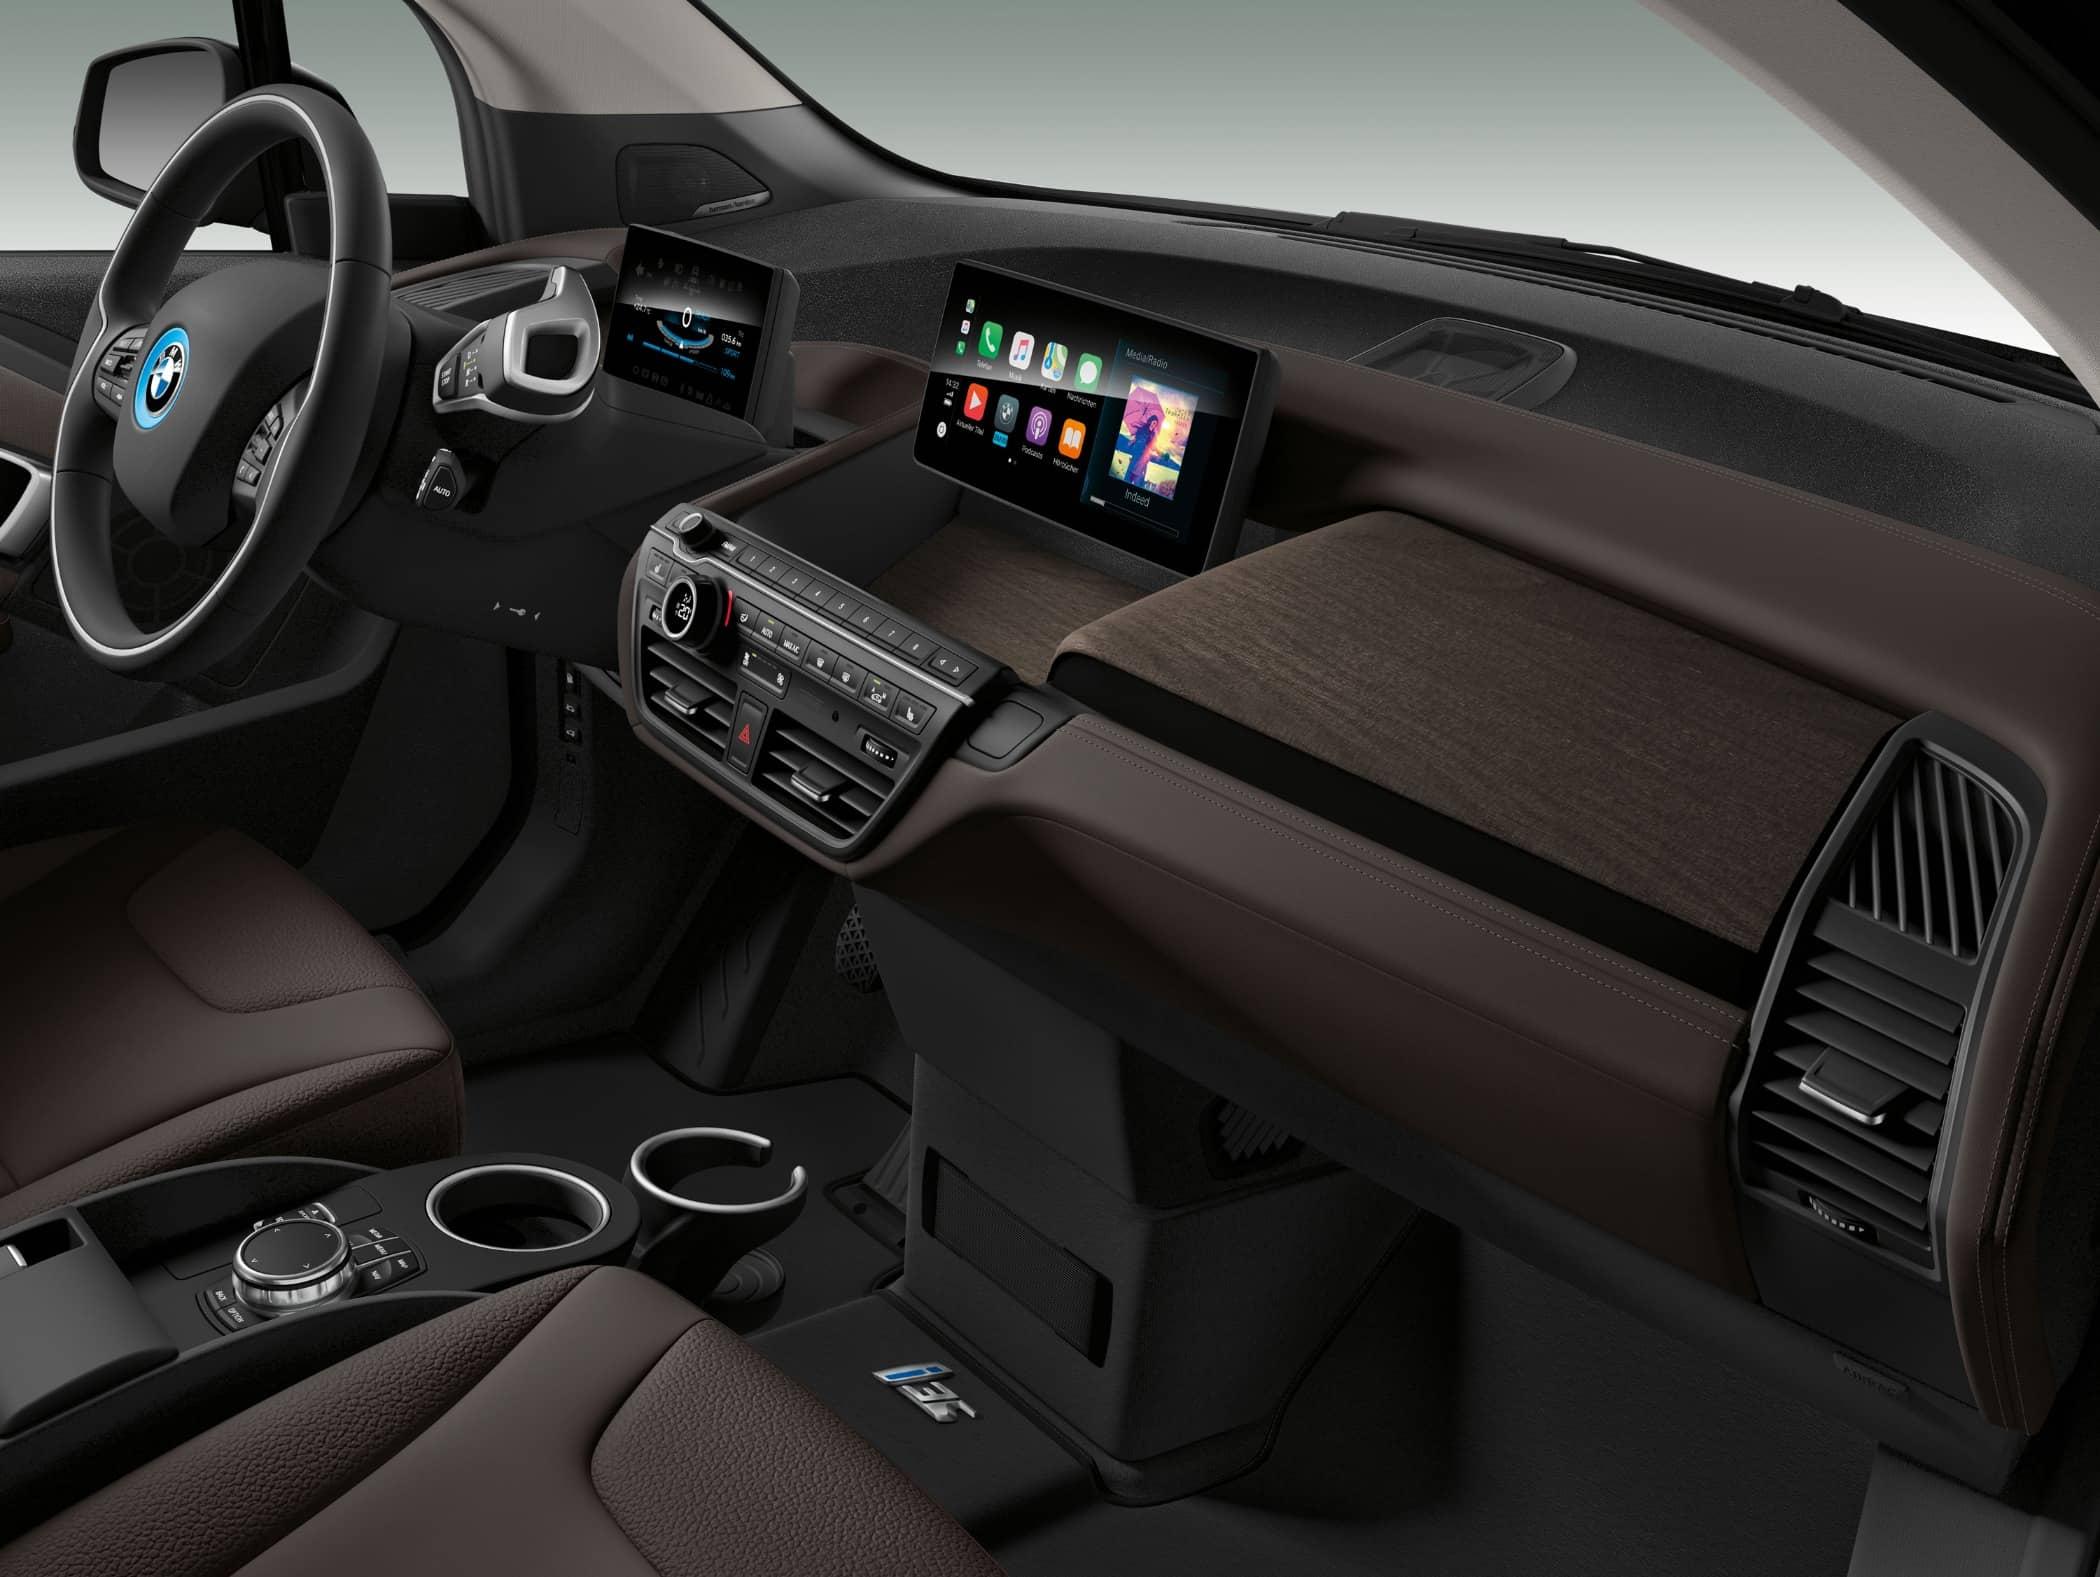 Automotive design, Luxury vehicle, Steering wheel, Center console, Car